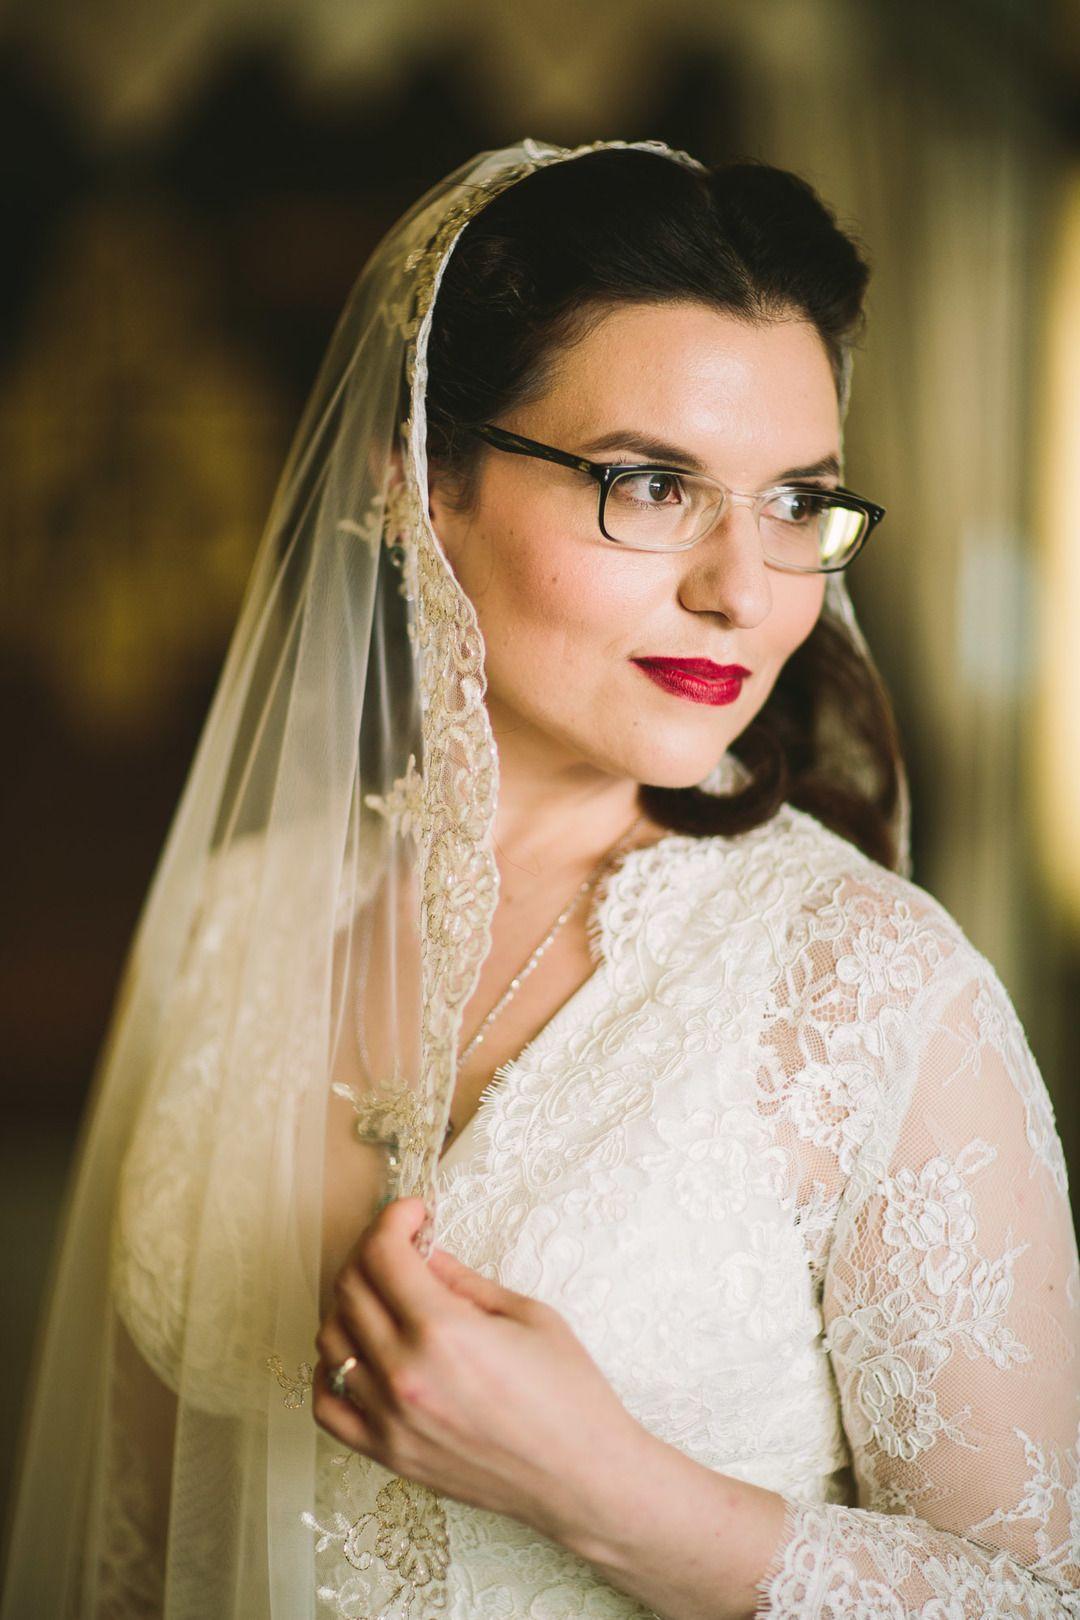 Vintage wedding style, lace bridal veil, bright red lip